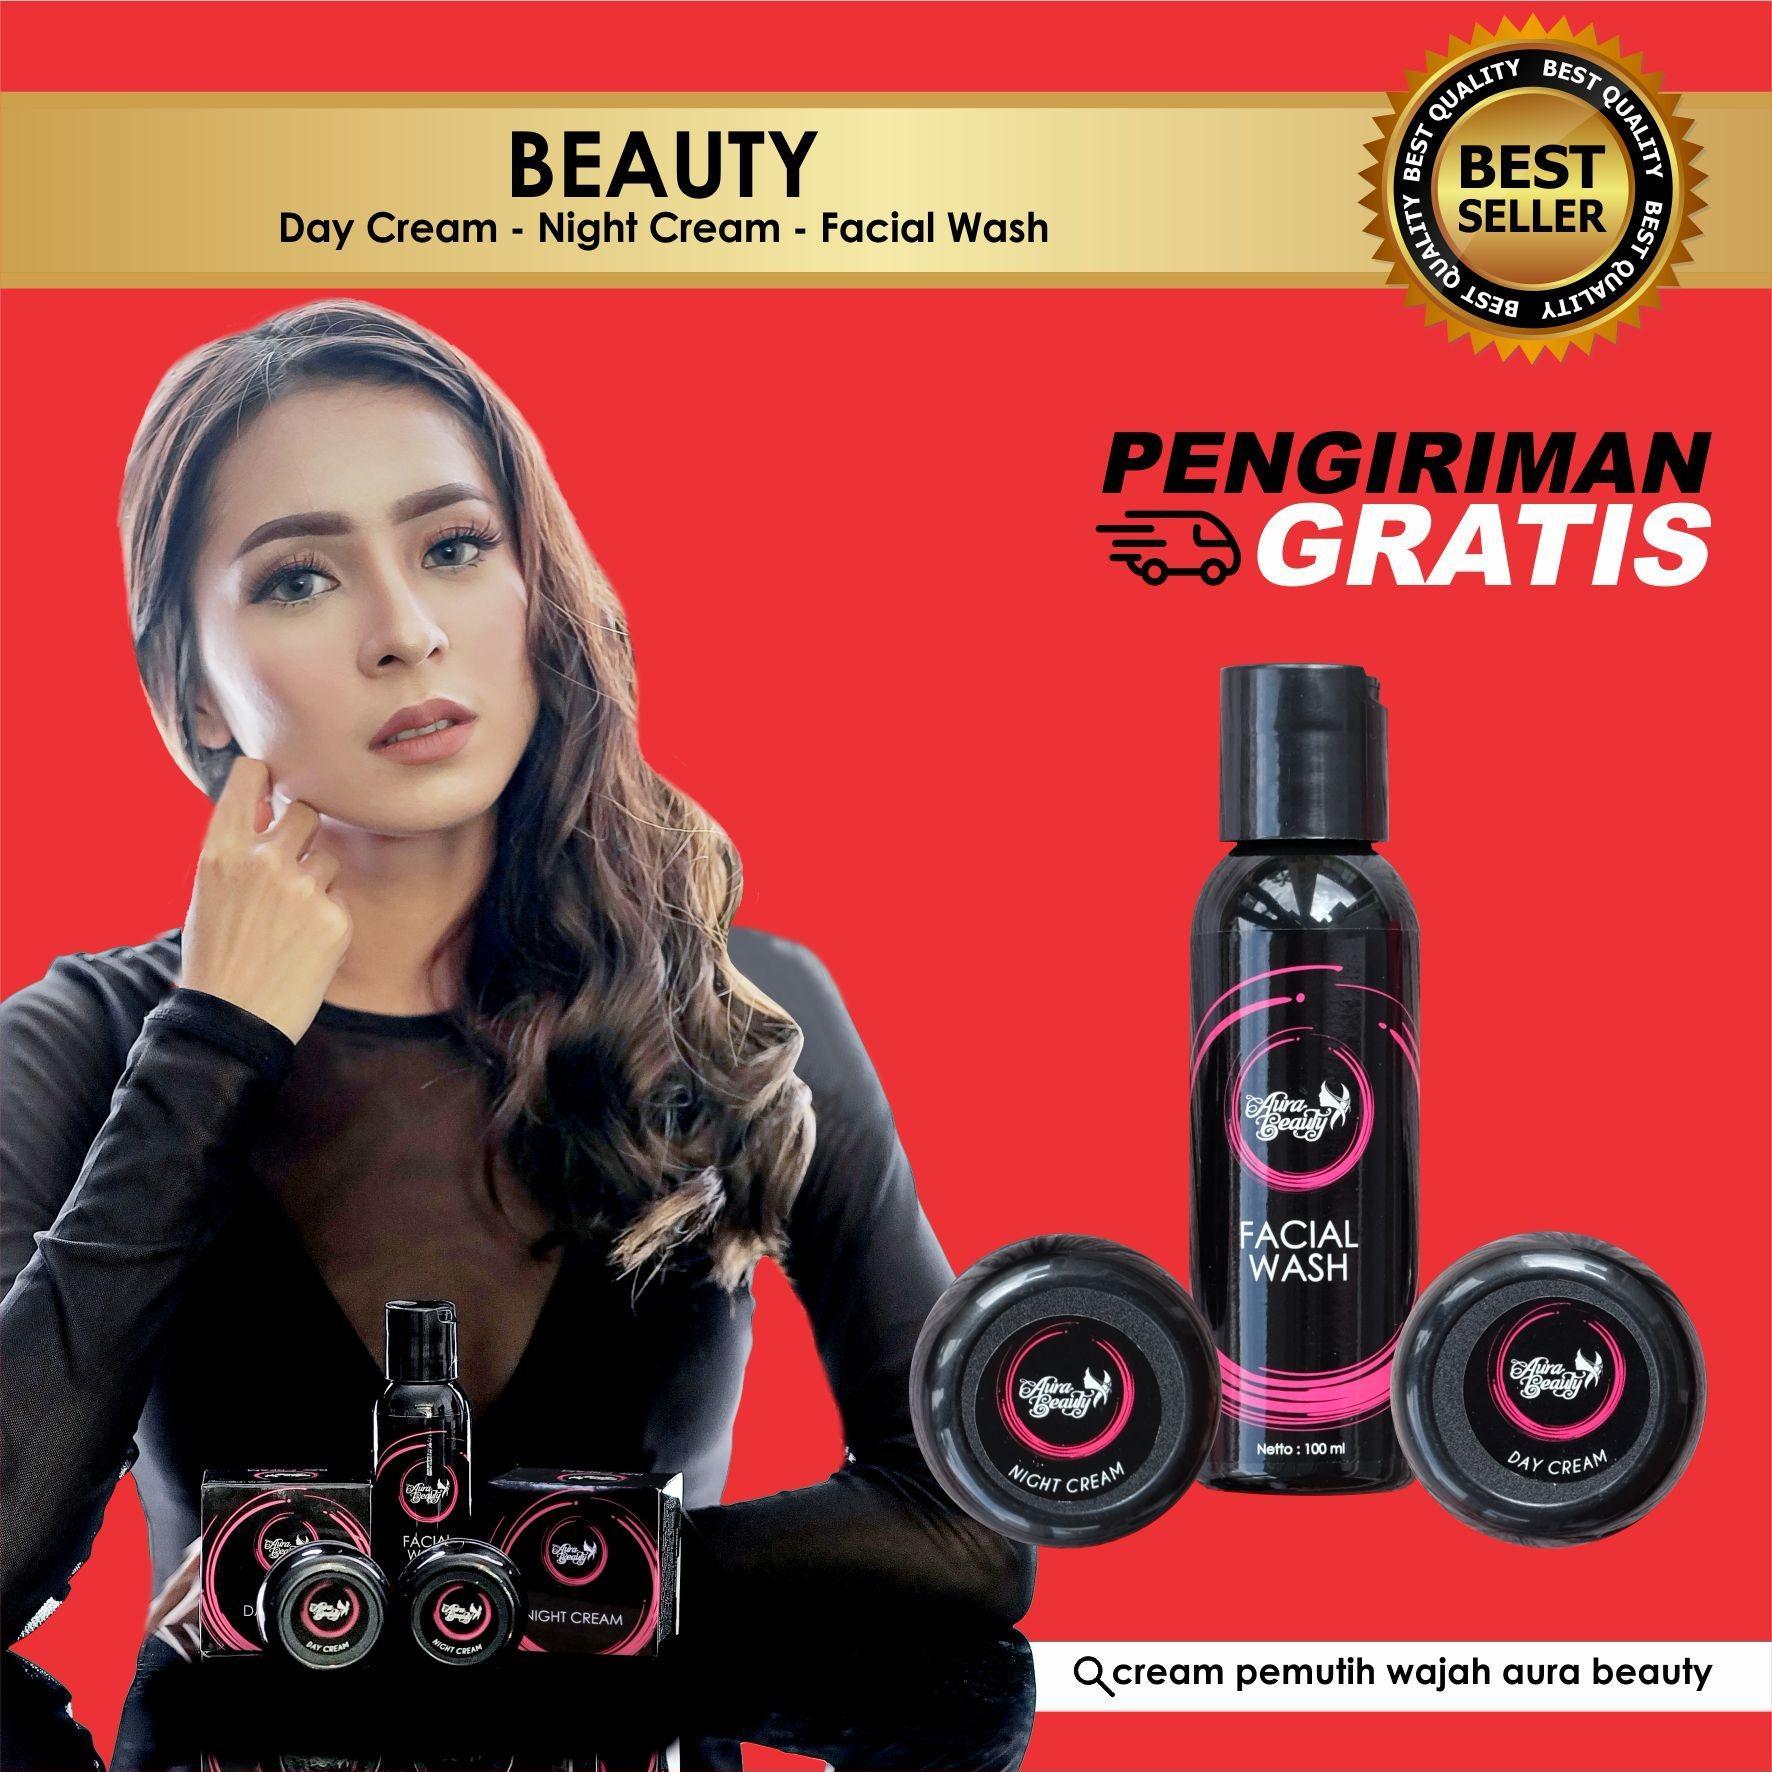 AURABEAUTY PACKAGE Non Serum - Cream Pemutih Wajah Aura Beauty Untuk Pria / Wanita AMAN 100% Original LAZADA